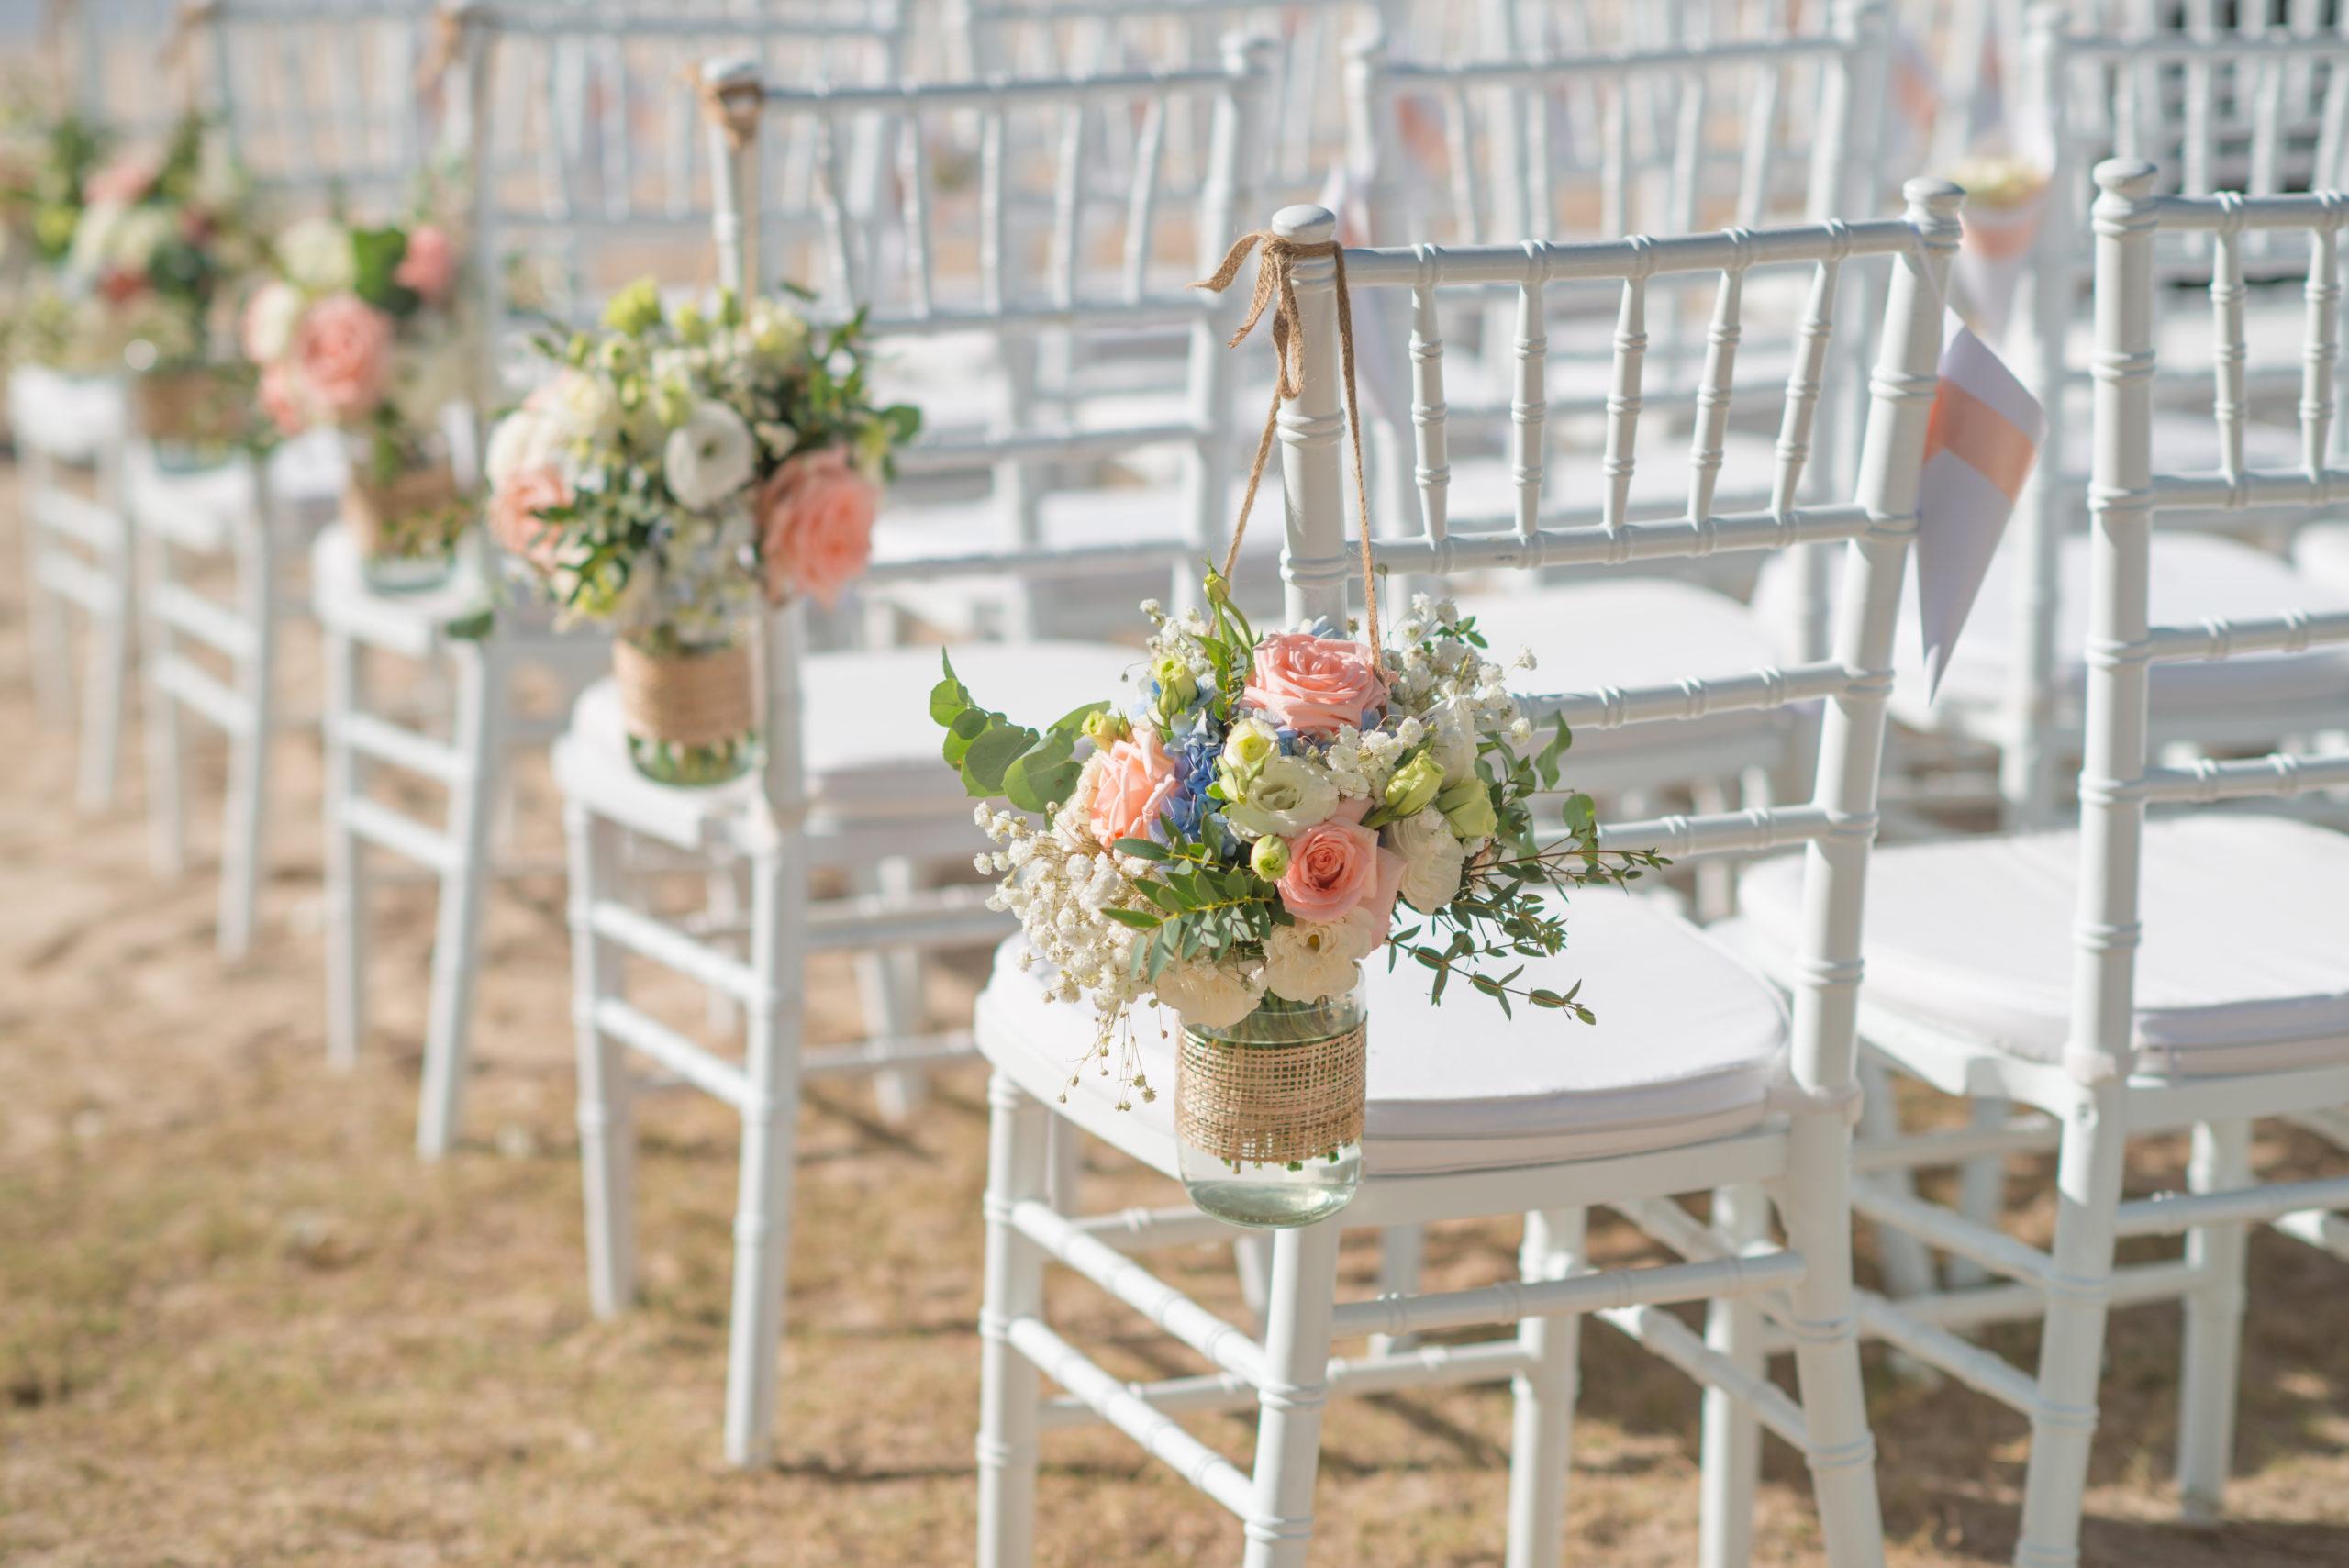 slow wedding donde celebrar